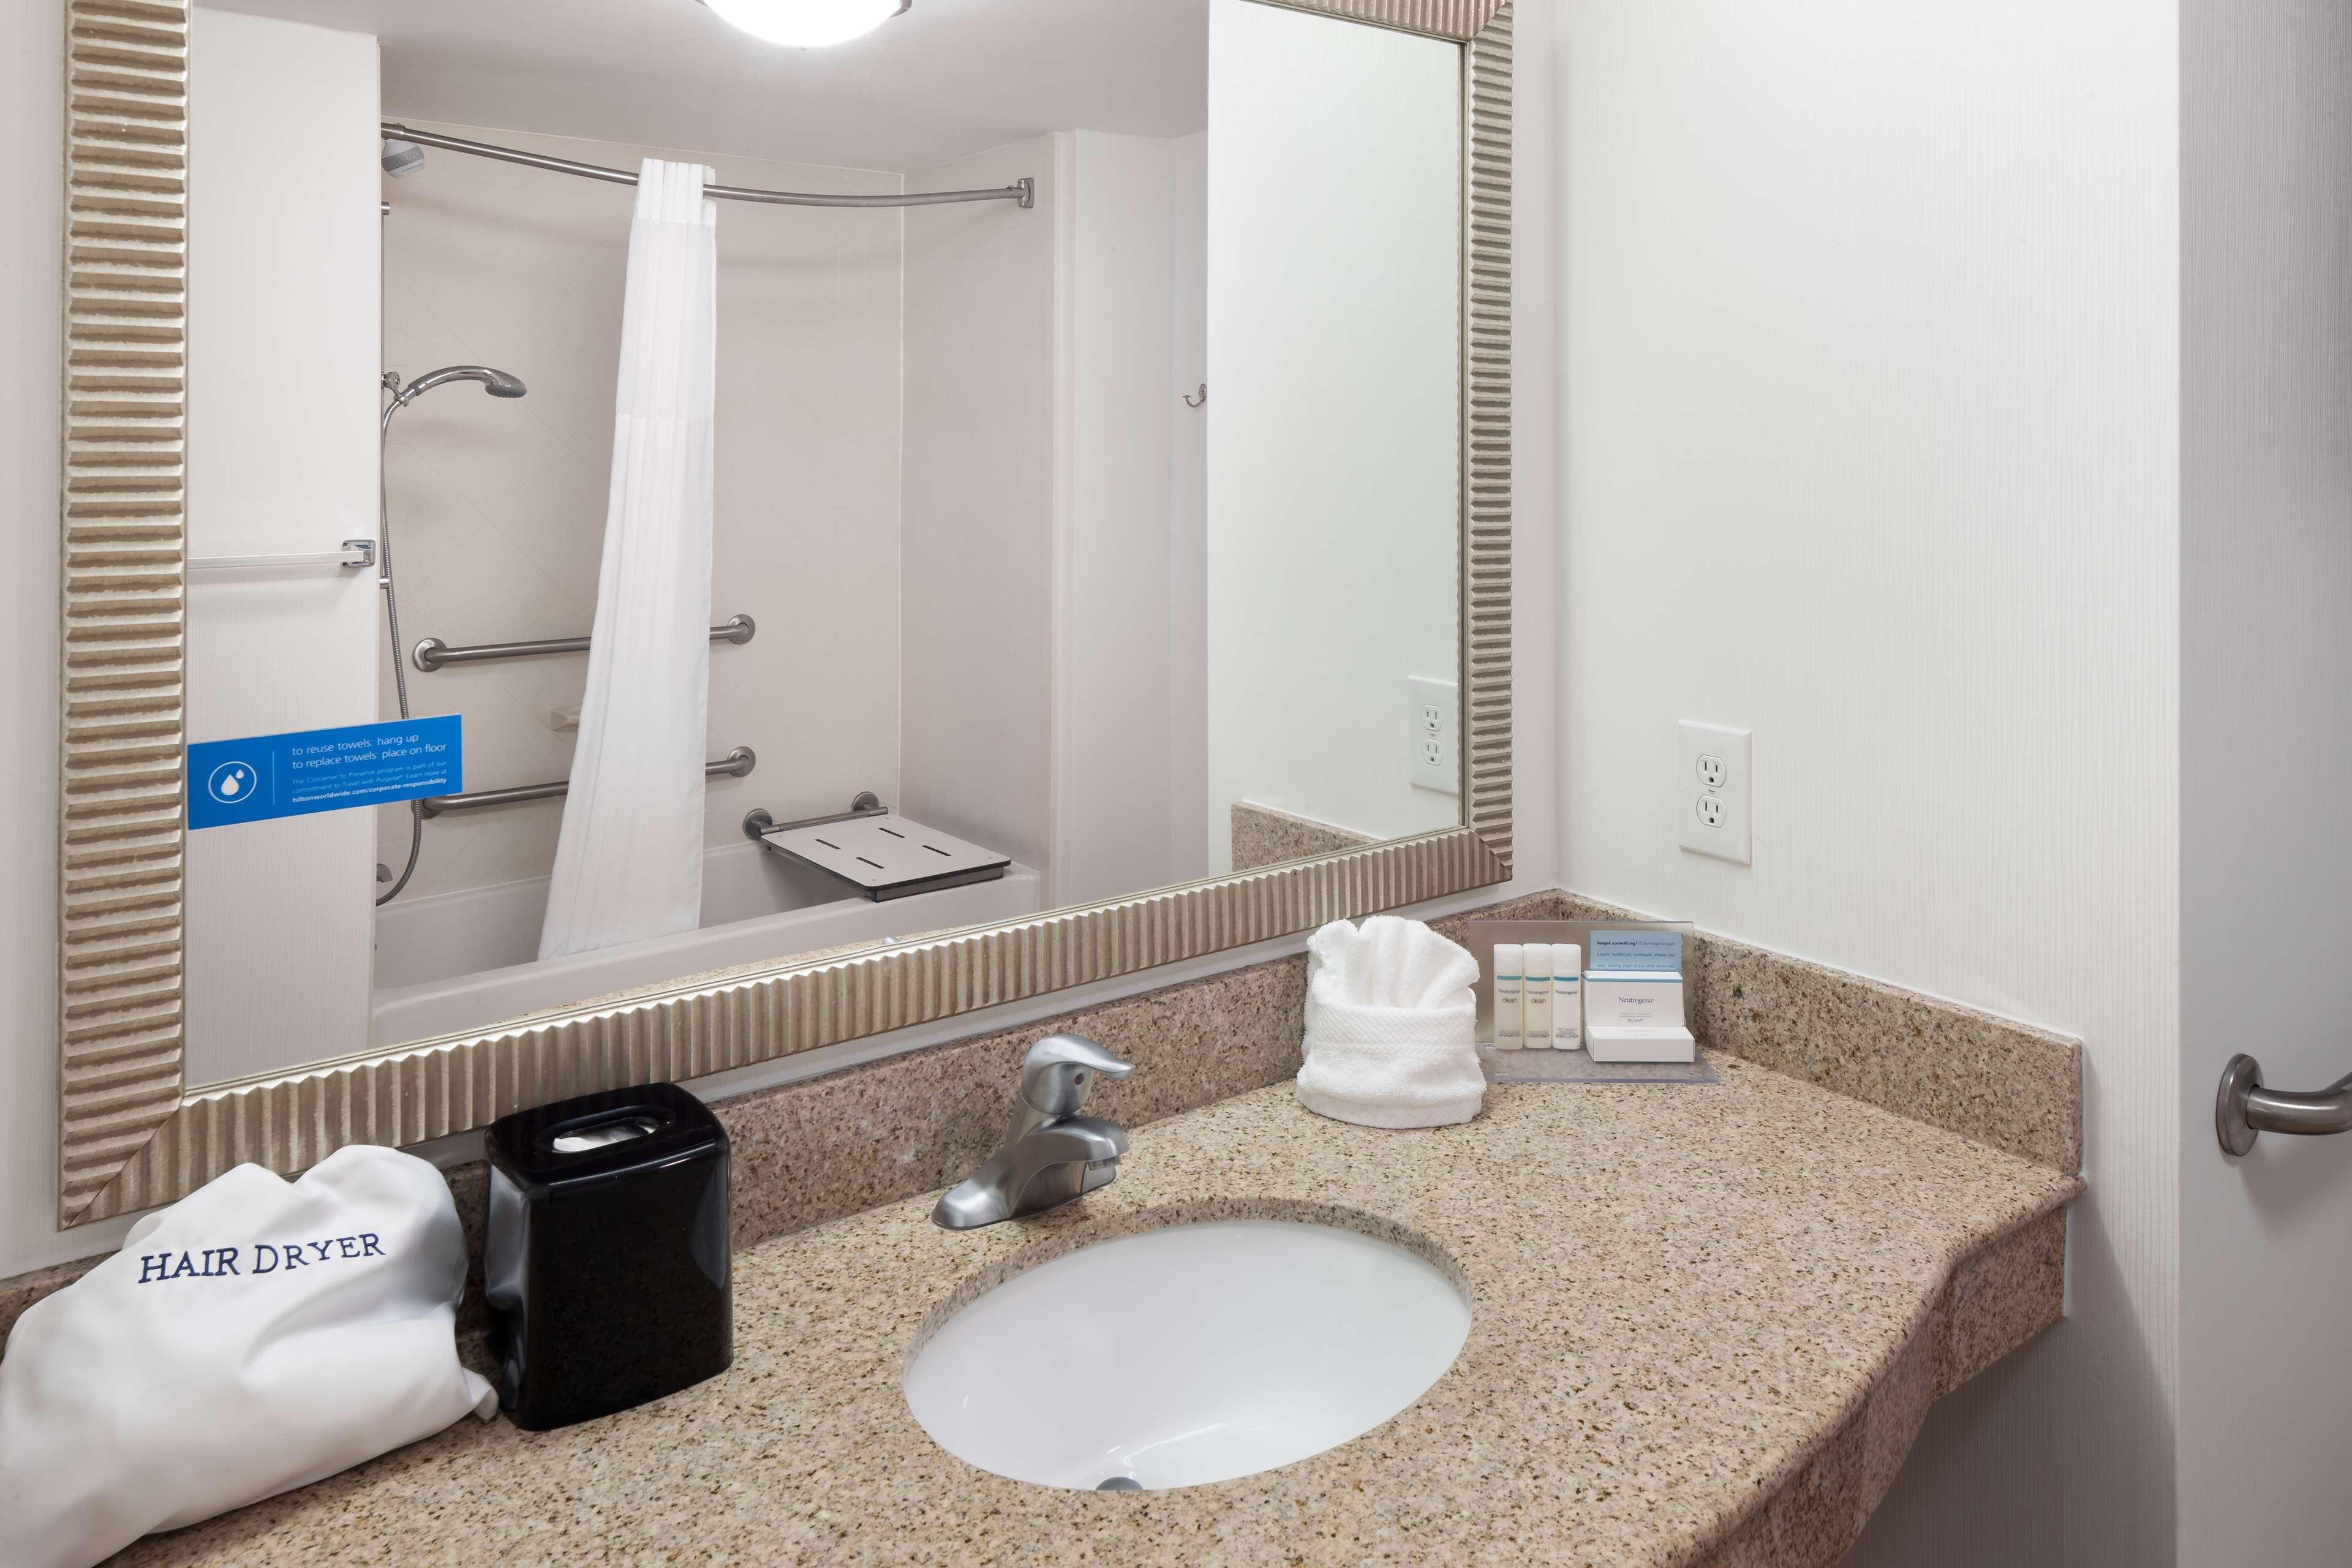 Hampton Inn & Suites Panama City Beach-Pier Park Area image 20